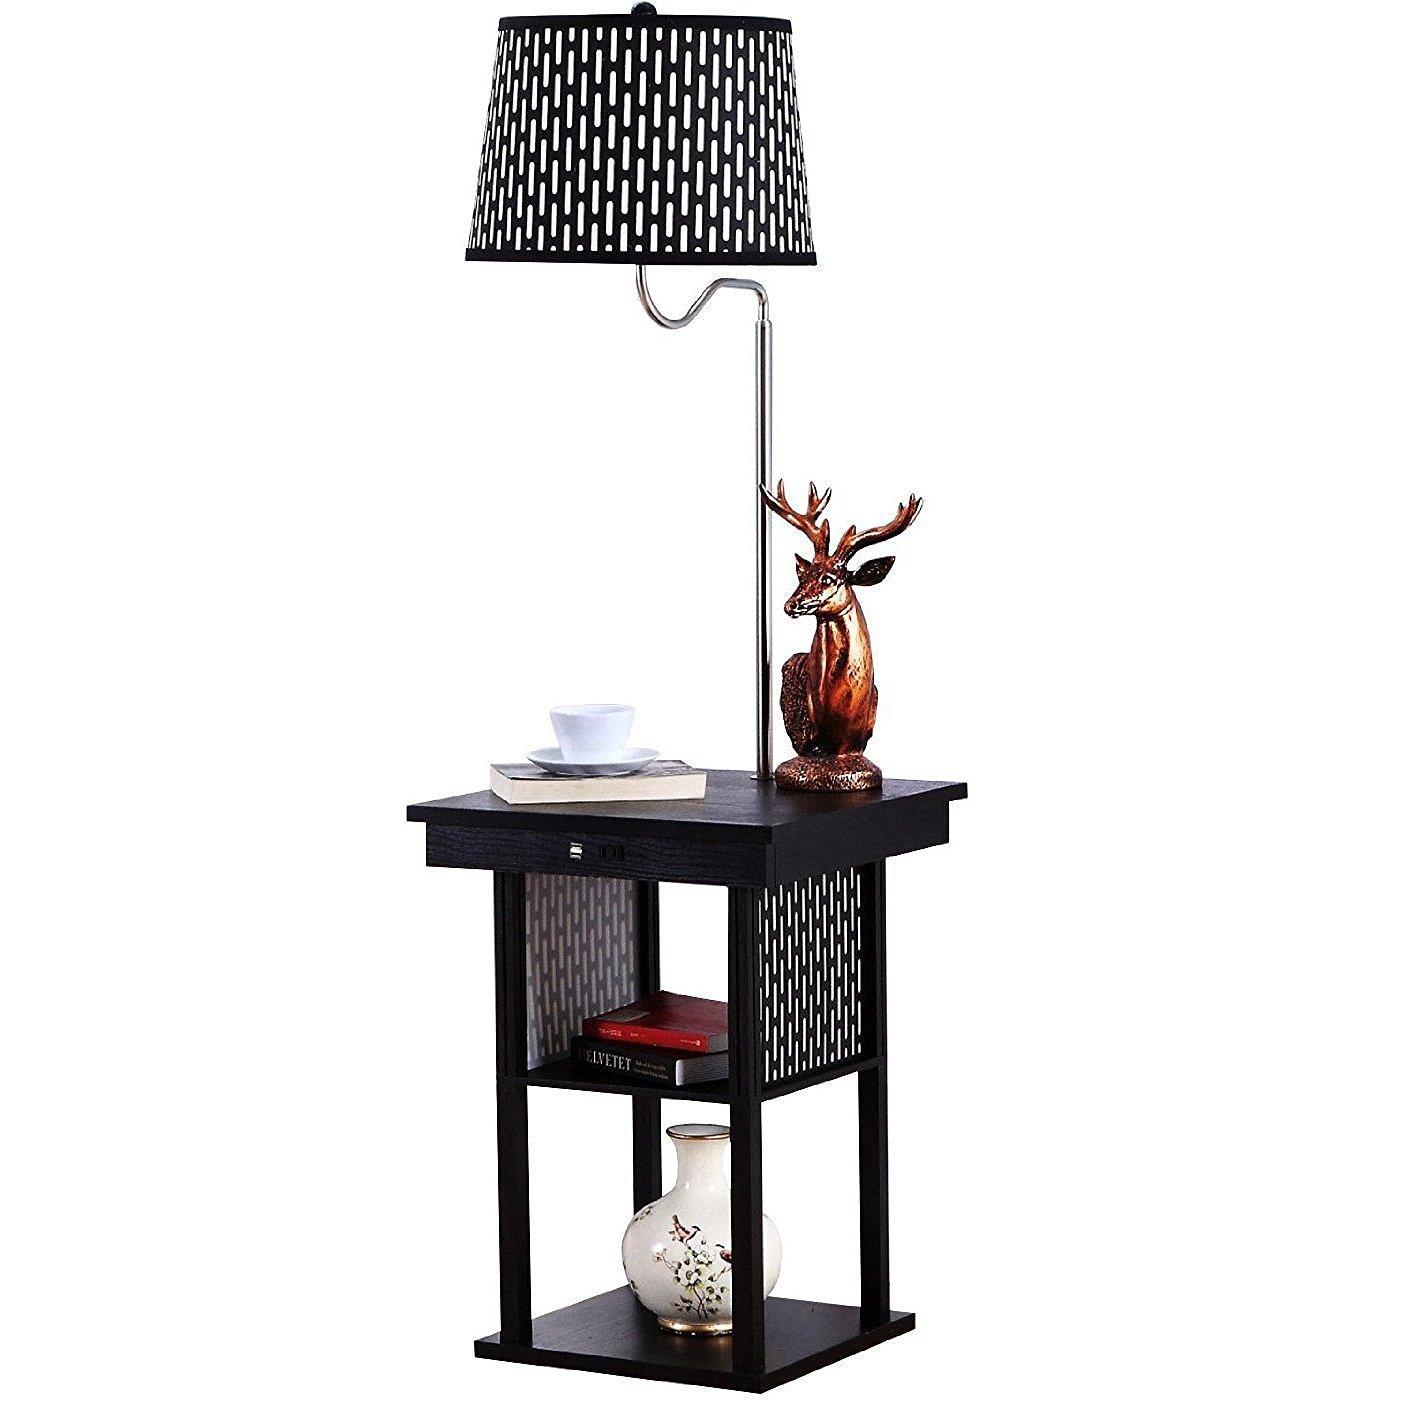 Details About Led Floor Lamp End Table Modern Electric Swing Arm Living Room Bedside Light